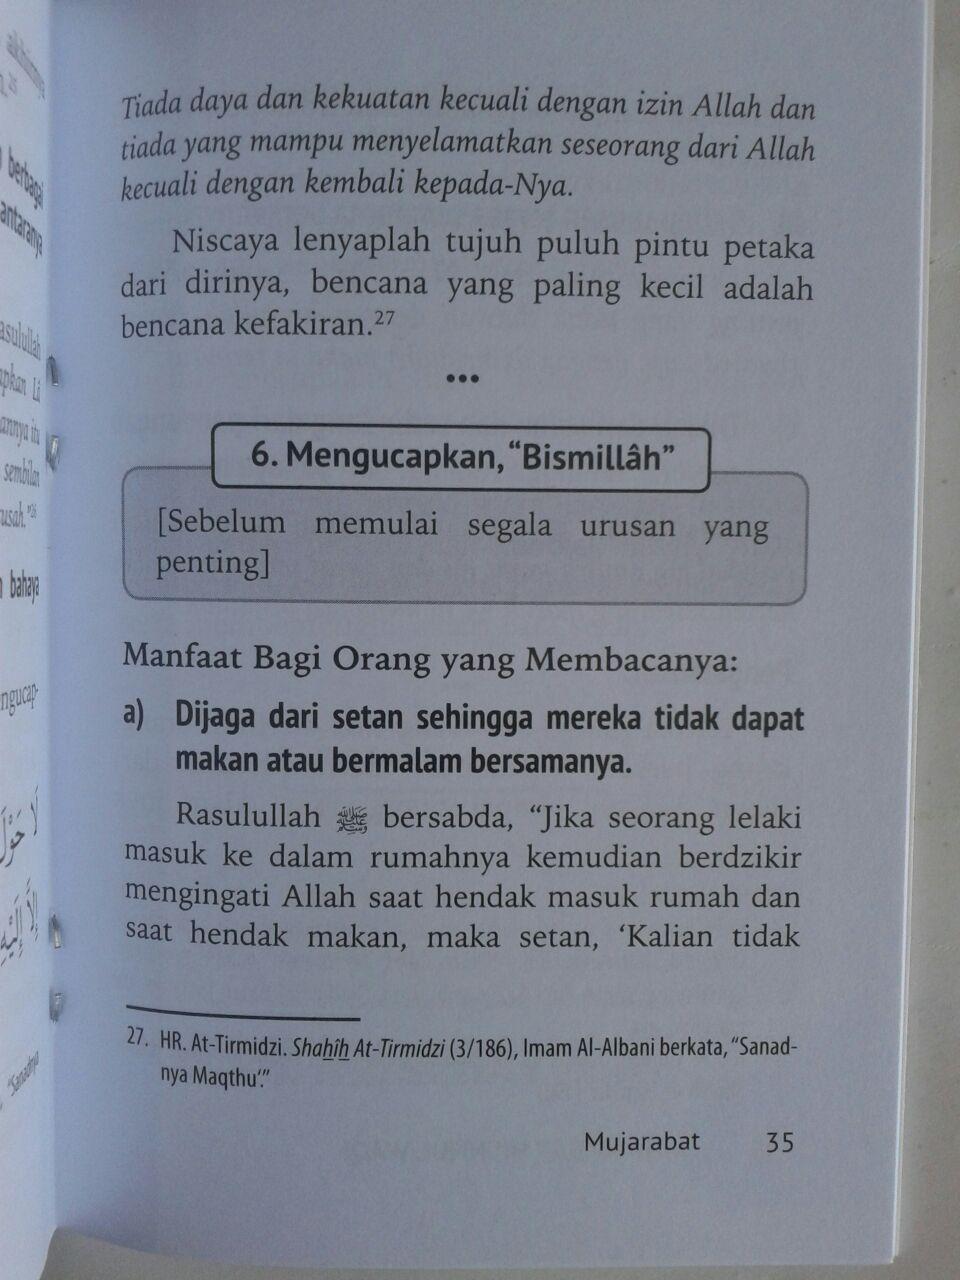 Buku Saku Mujarabat Hisnul Waqi Doa Dzikir Dari Keburukan isi 2